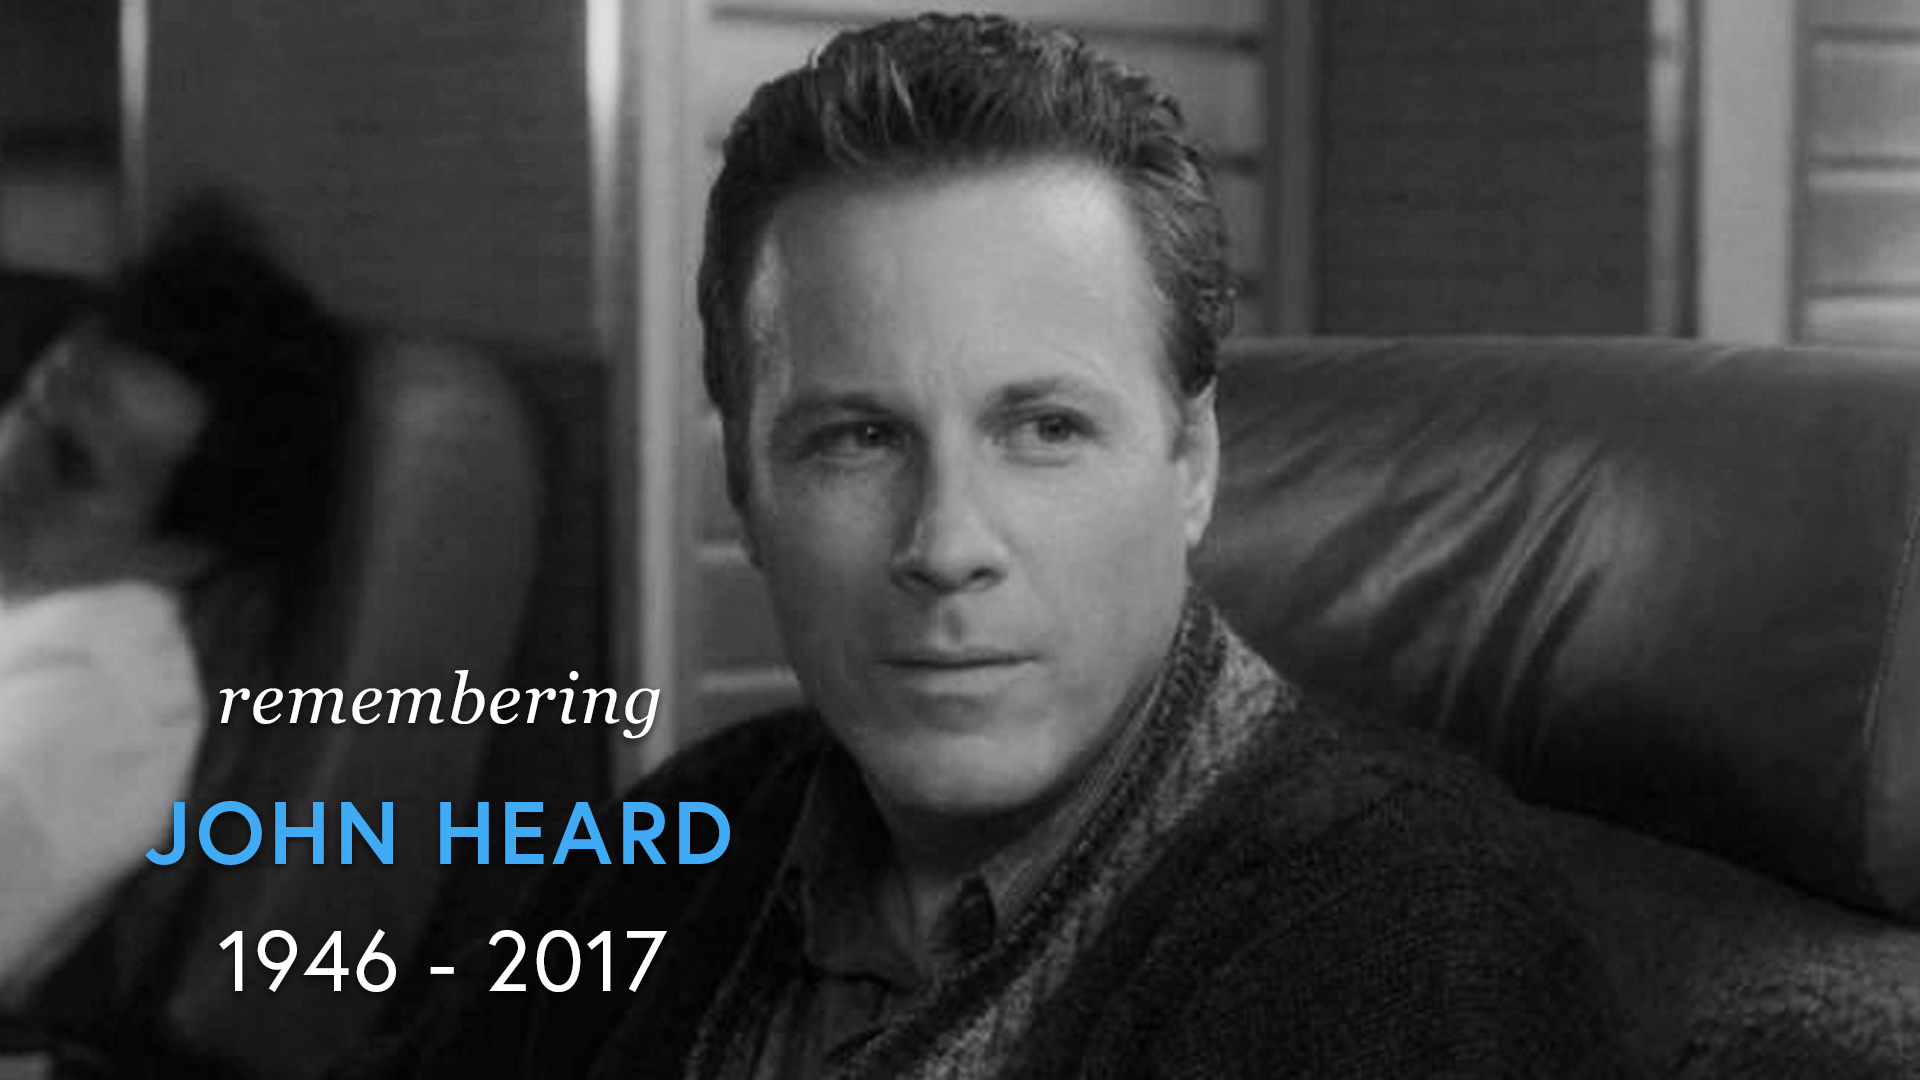 Remember John Heard (1946 - 2017) screen capture